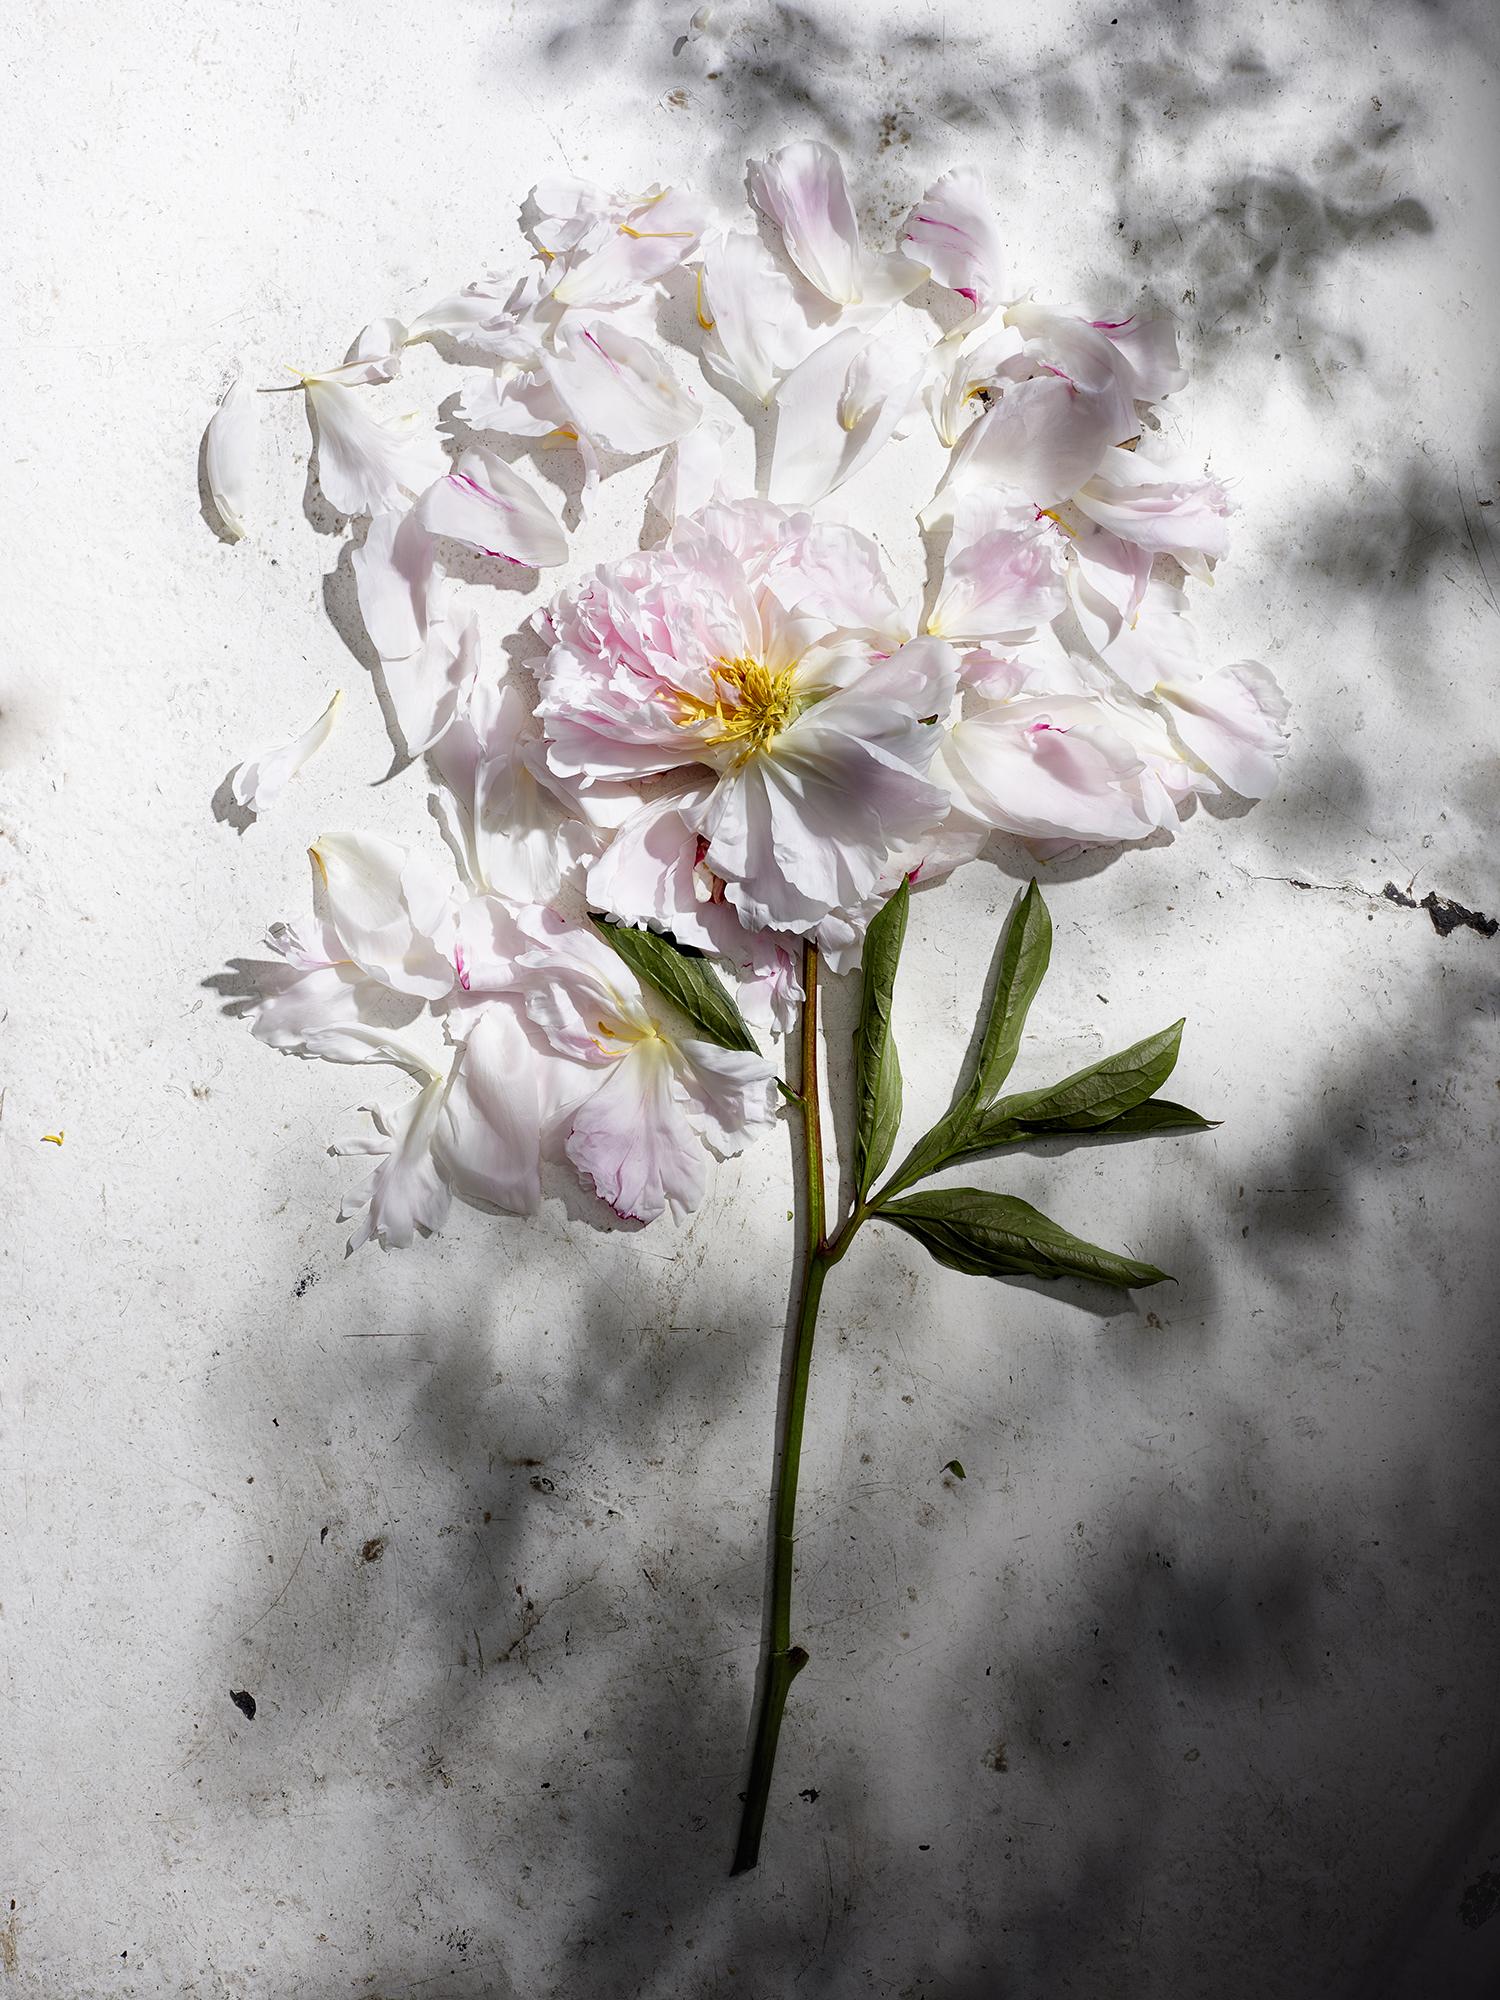 20150615_Flowers_Tear.jpg